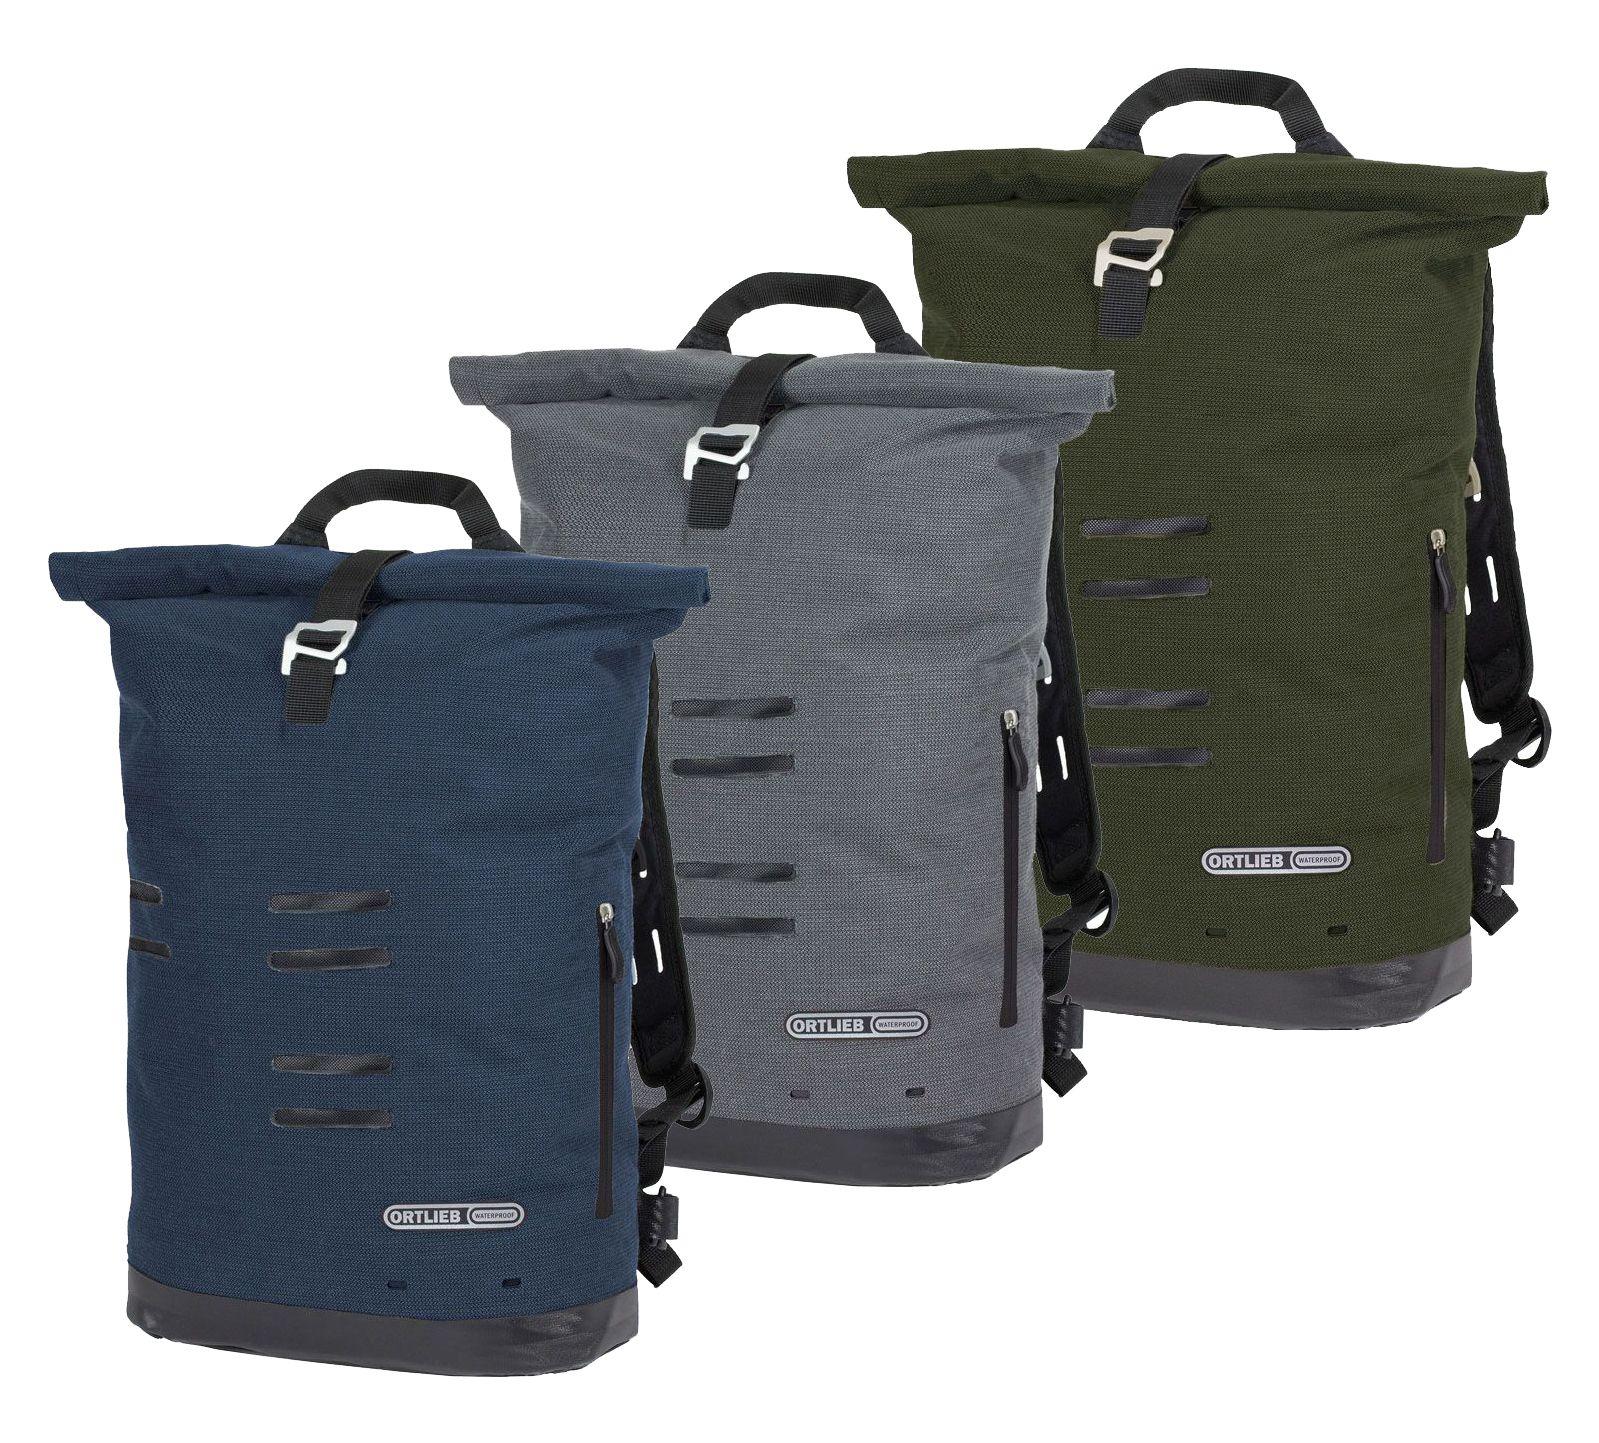 7e72cdde1ec Ortlieb Commuter Day Pack Urban 21 Litre Backpack - £136.39 | Bags ...